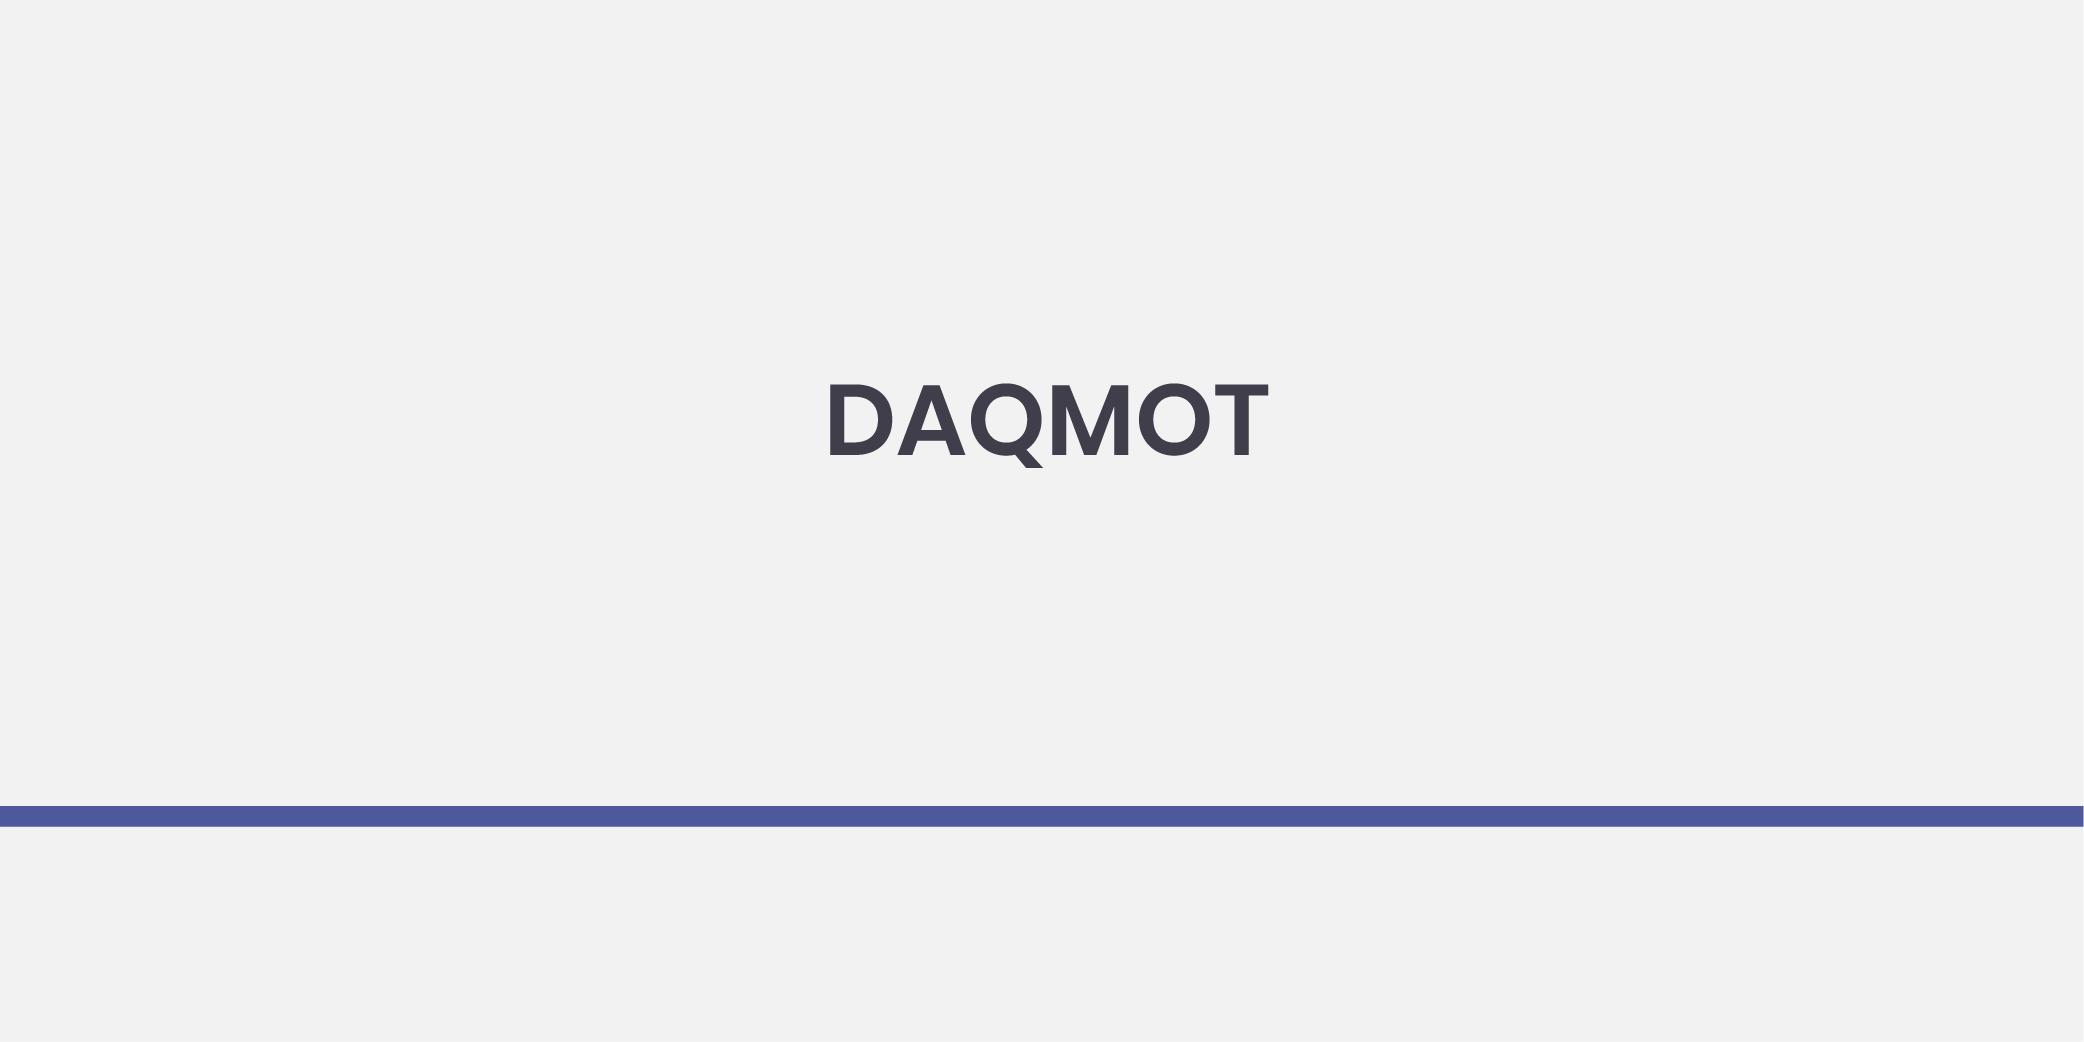 DAQMOT